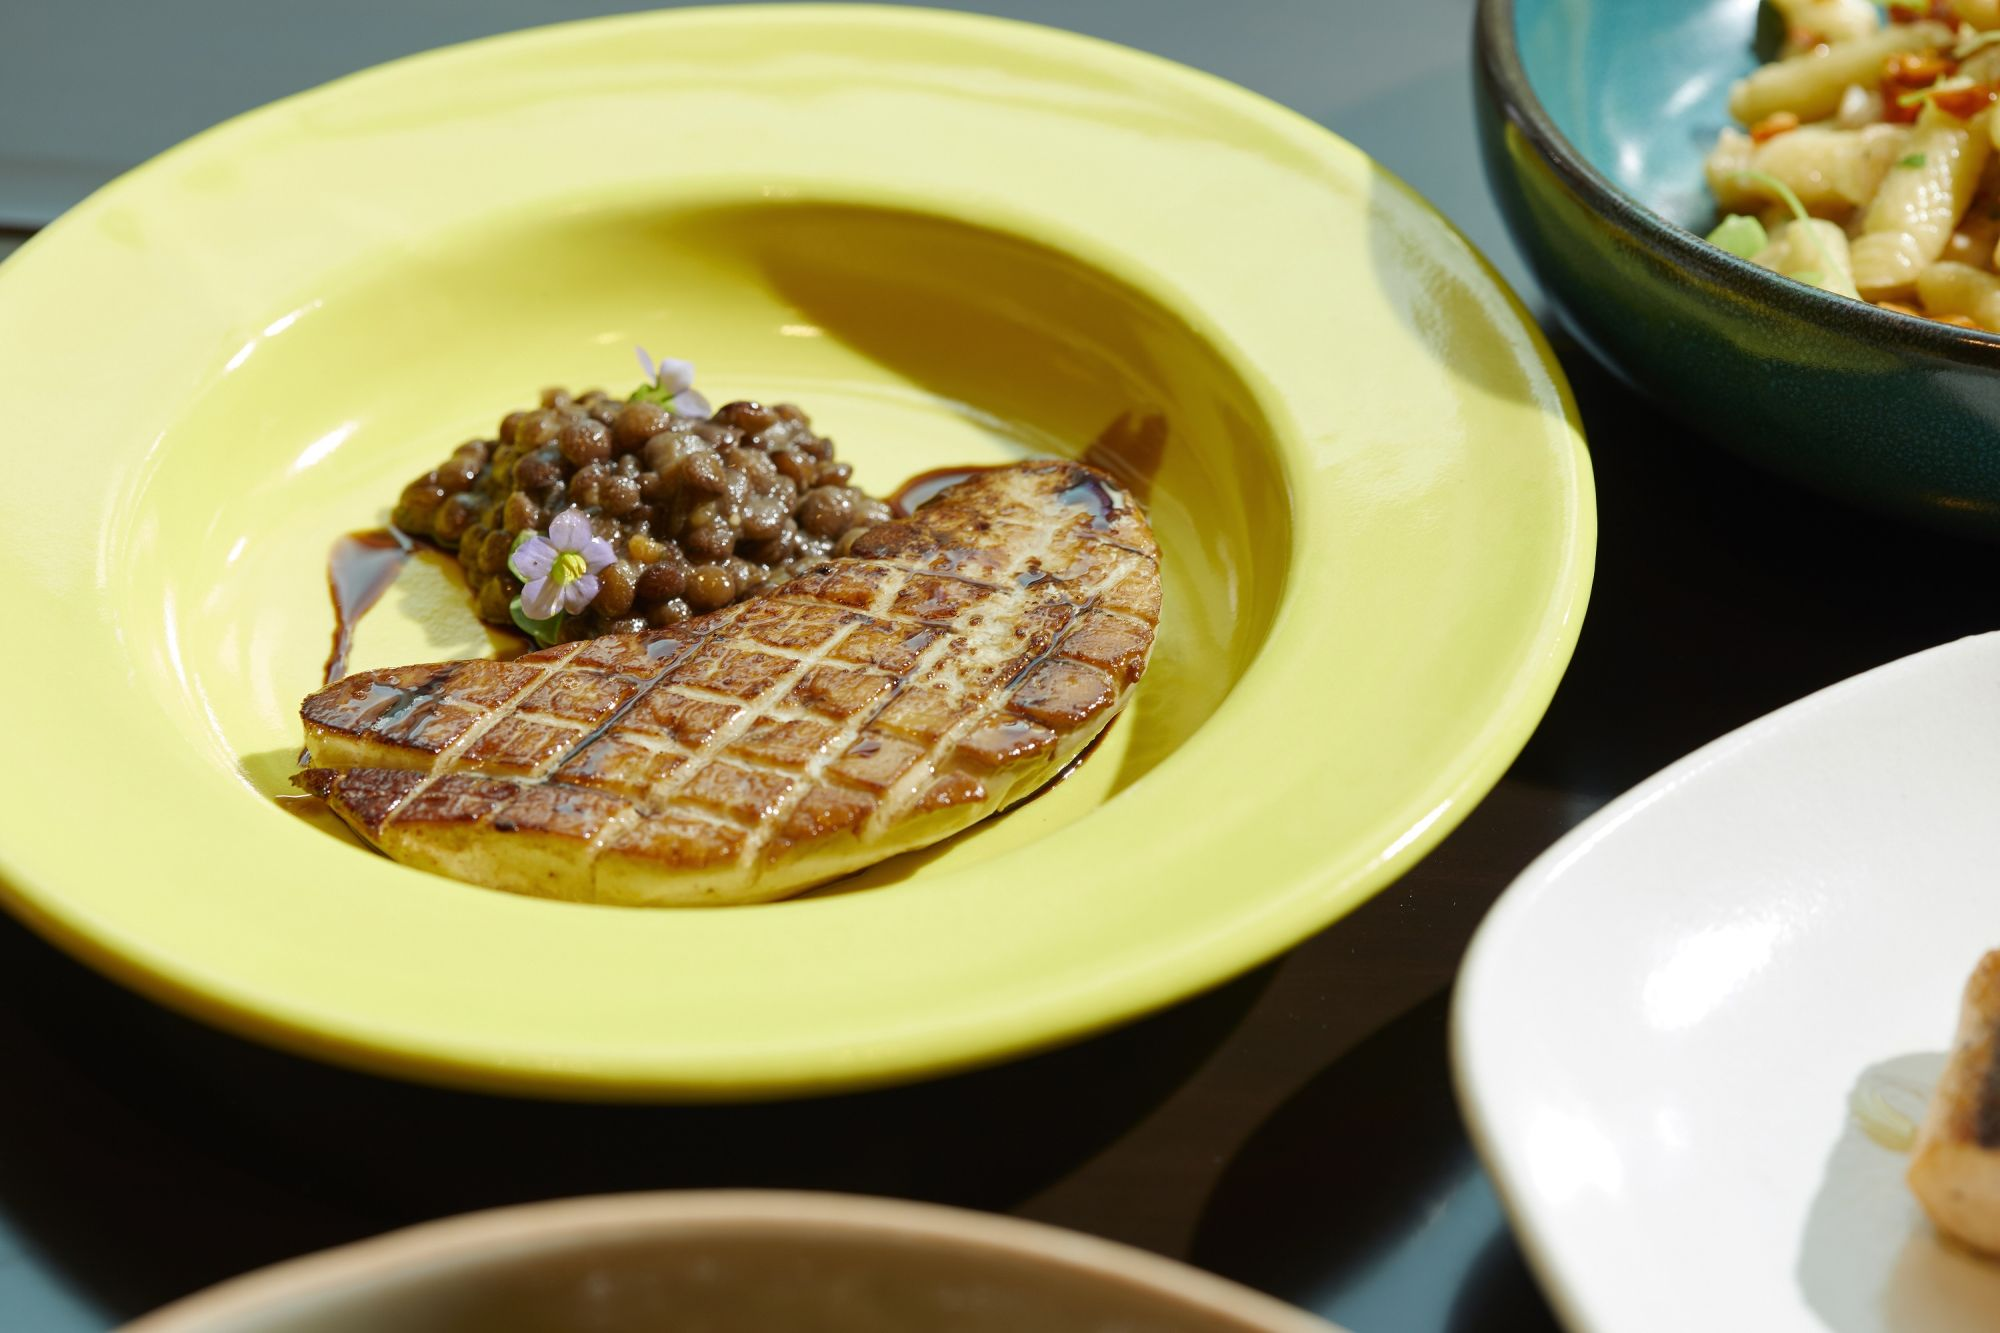 French pan-seared foie gras